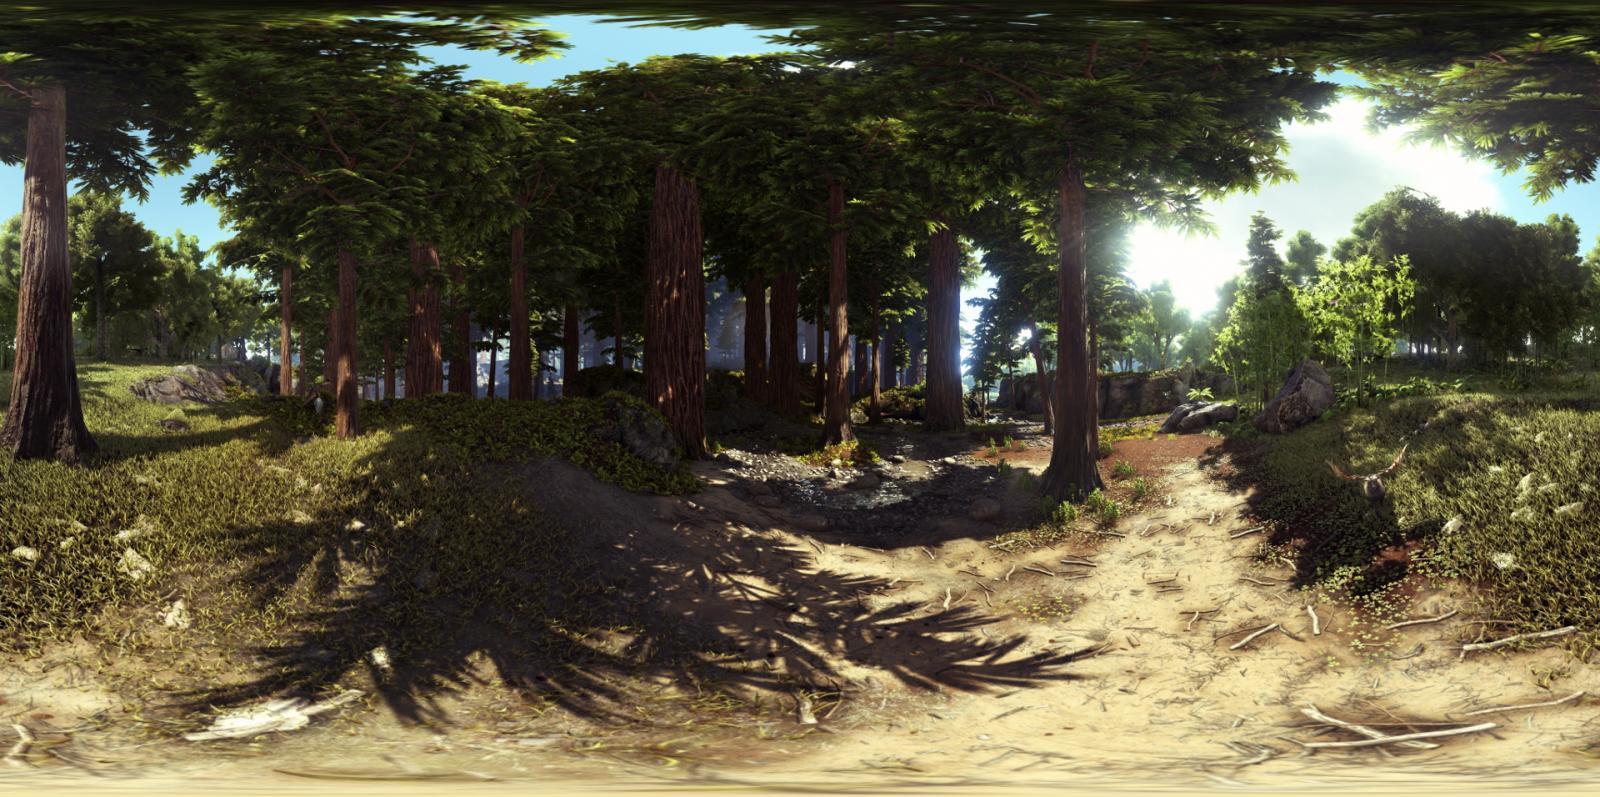 large.59218e5ab041d_KISHKO-RedwoodParadise-360Stereosta.jpg